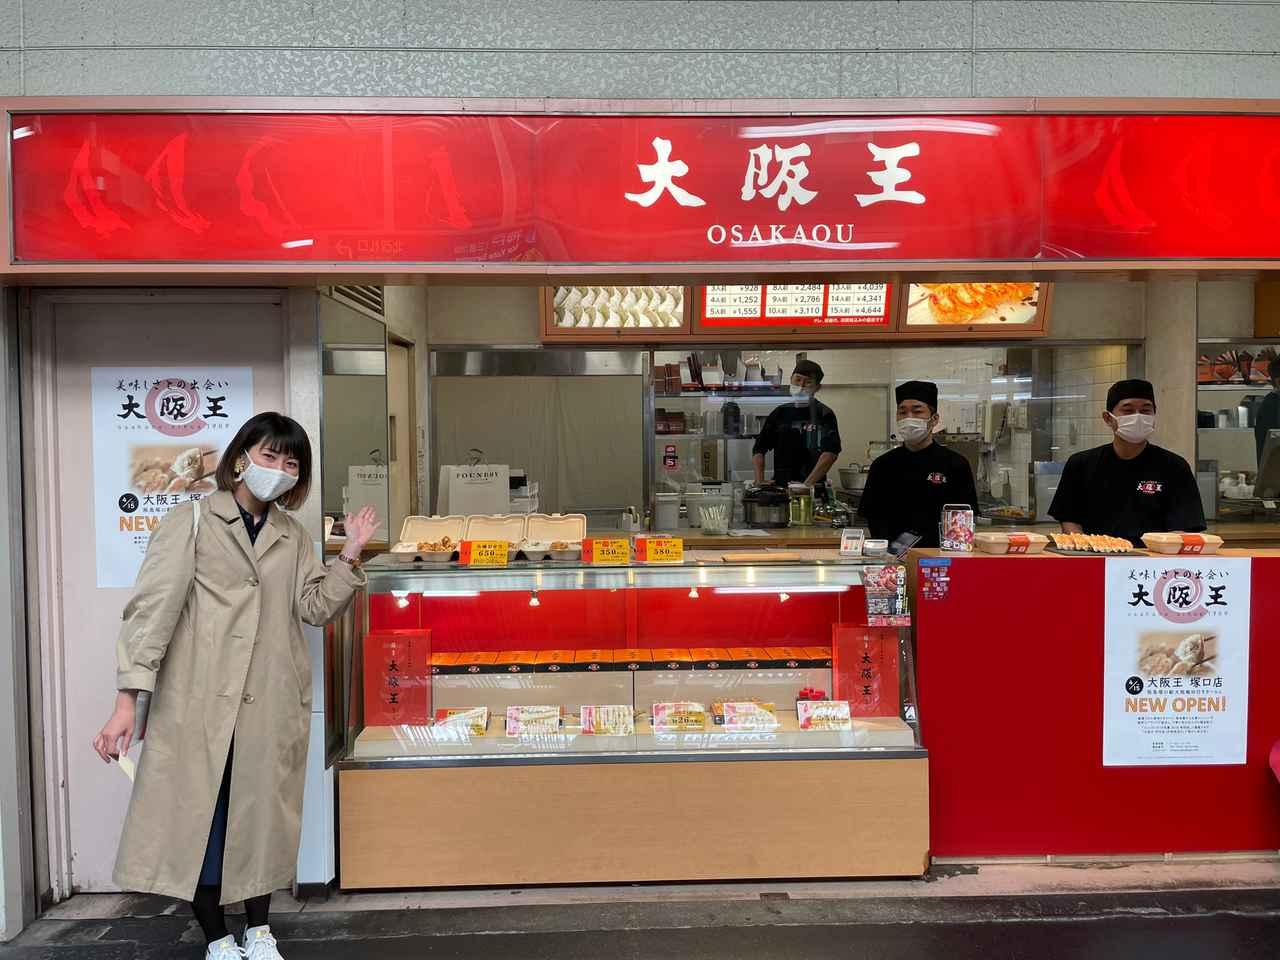 画像1: 4月23日:「大阪王 presents 彩名が行く!餃子世界化計画」